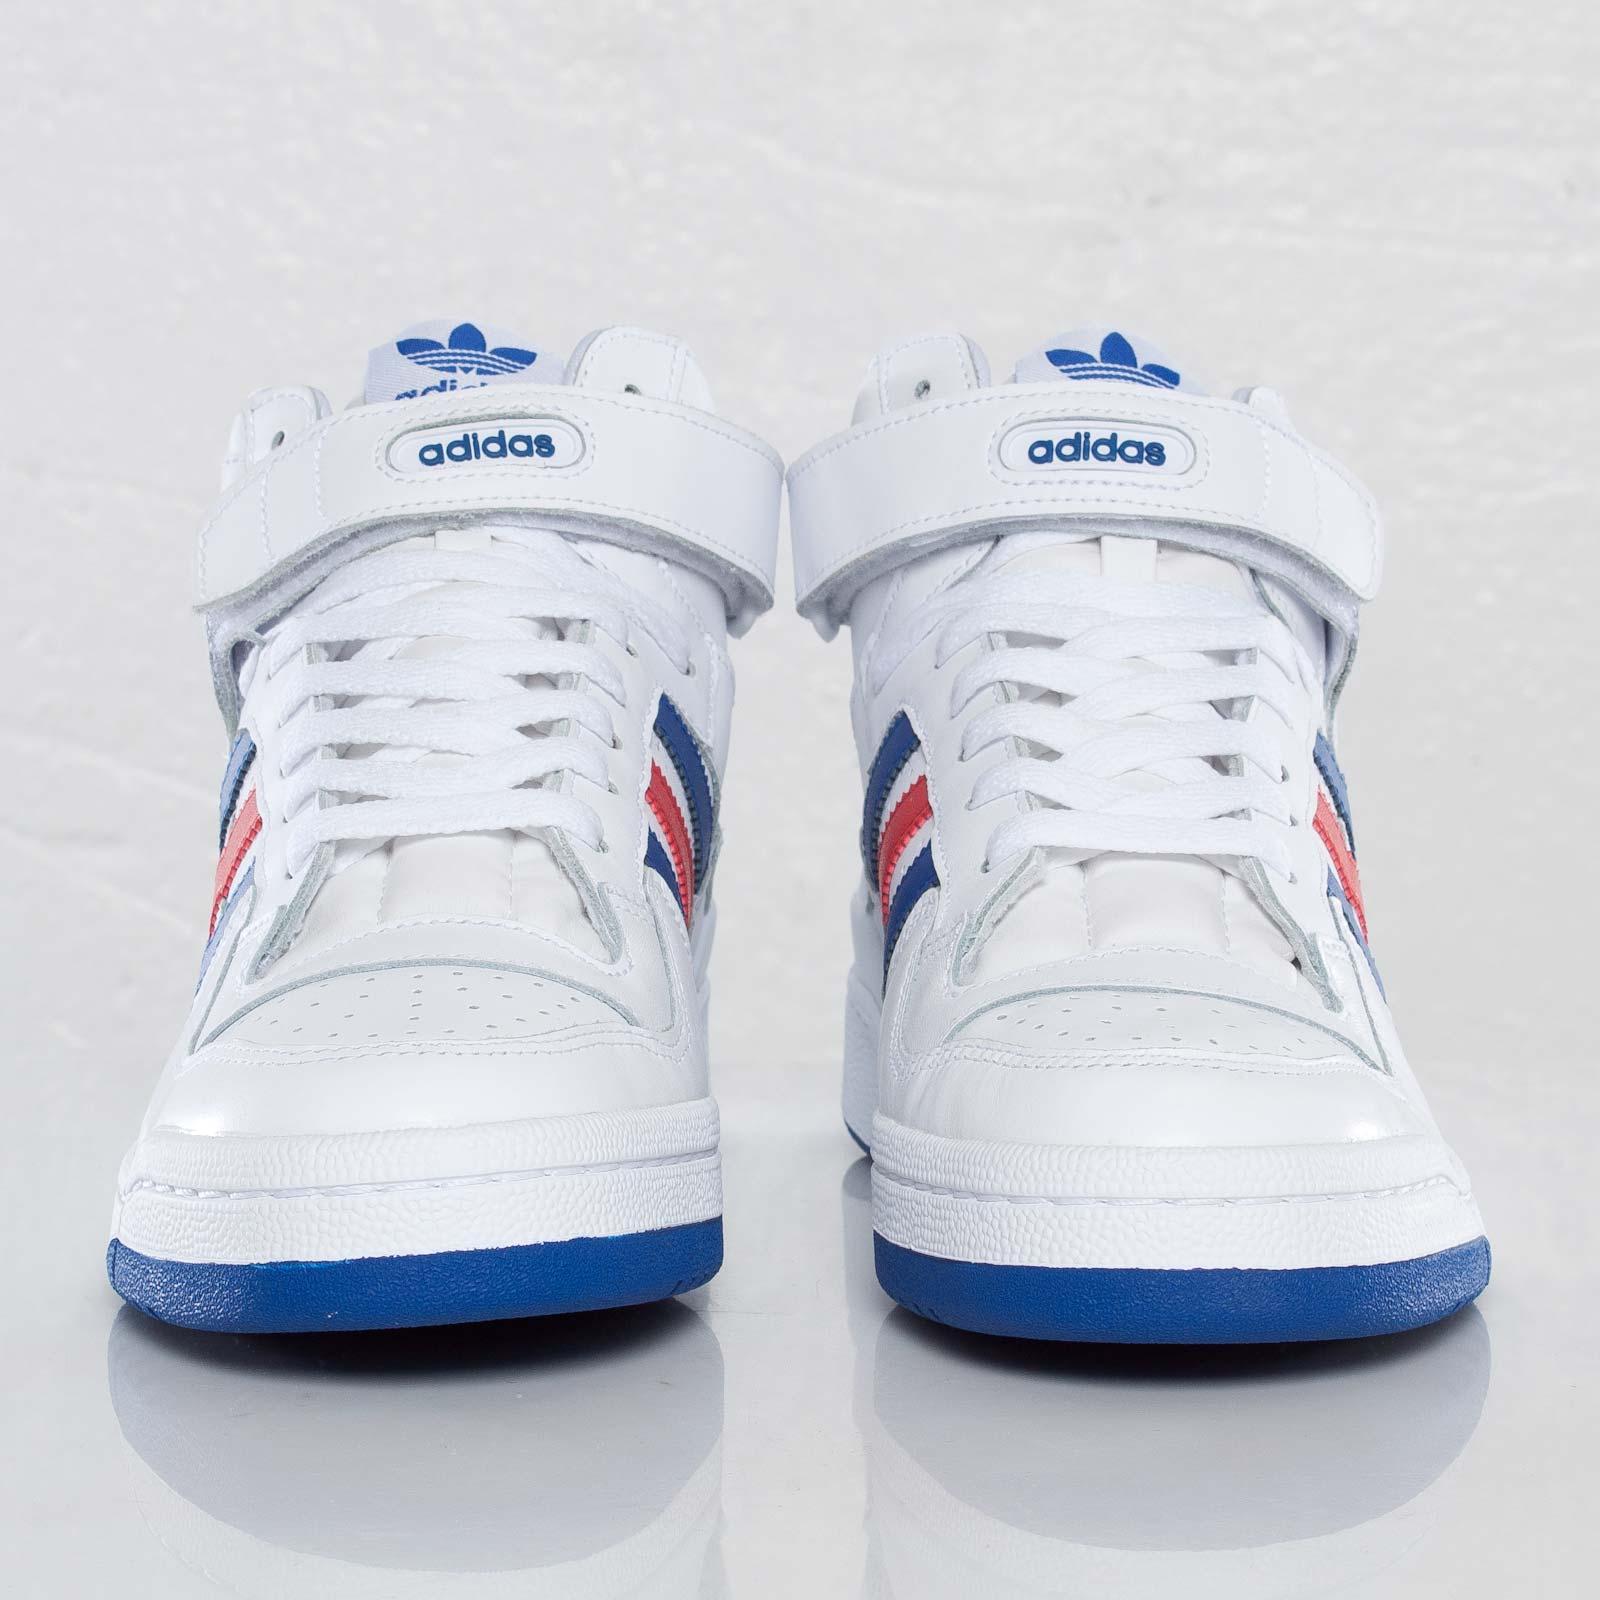 sale retailer 32c3a c41f3 adidas Forum Mid - 110426 - Sneakersnstuff   sneakers   streetwear online  since 1999